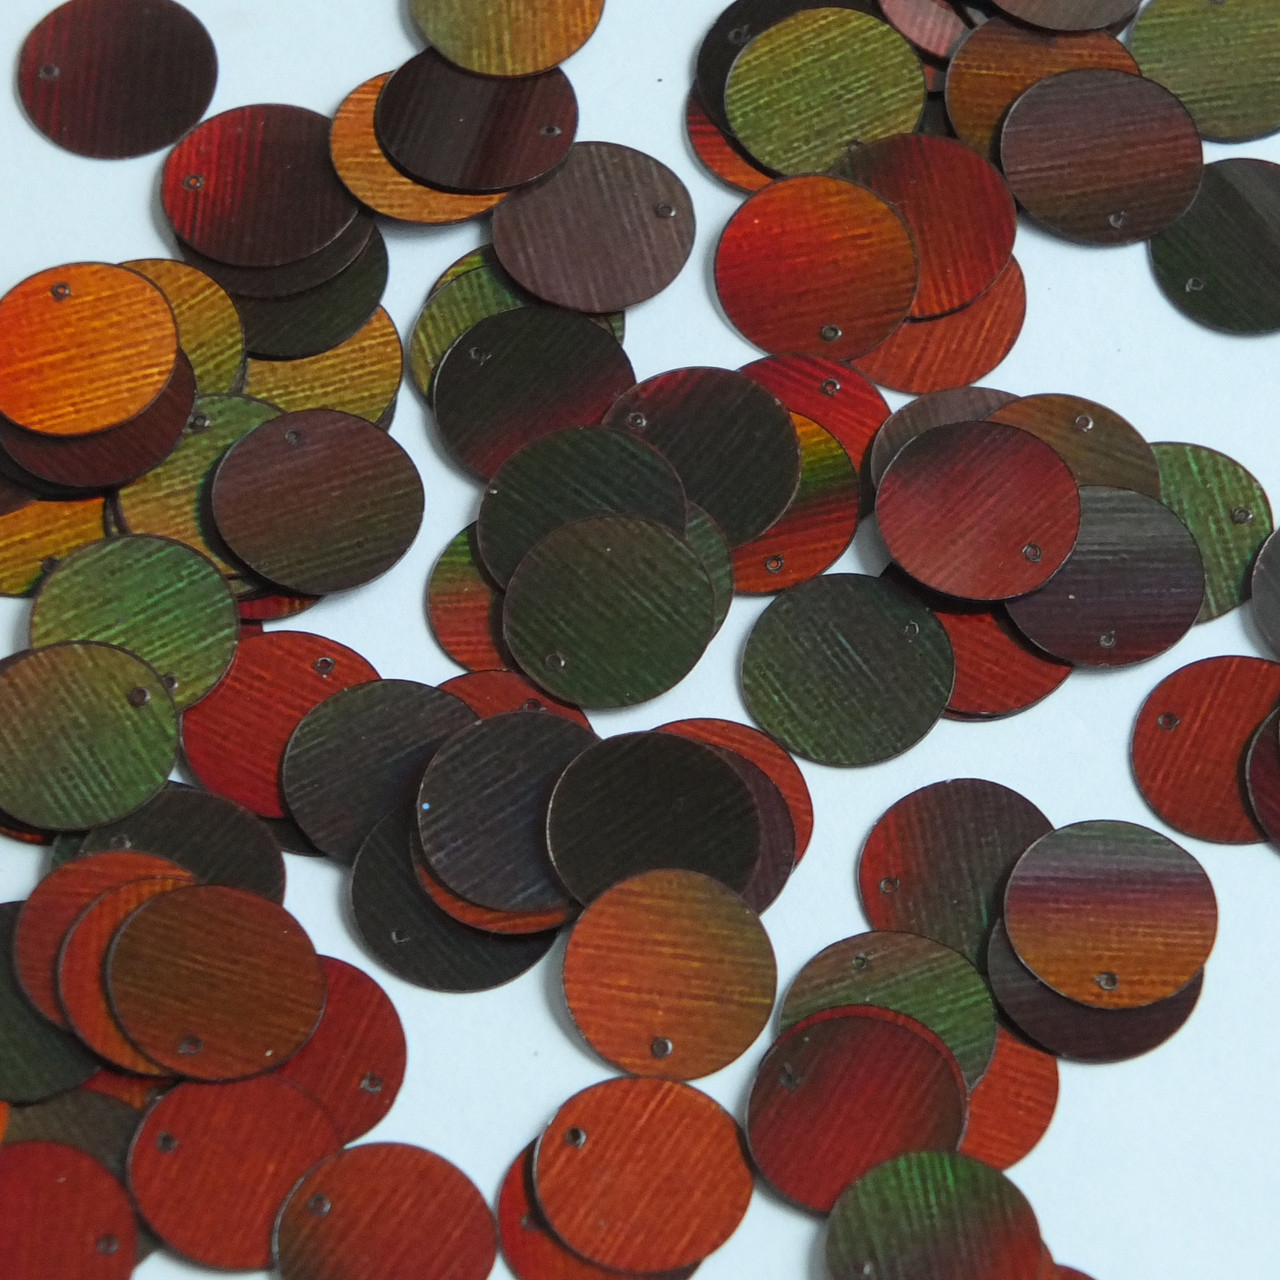 Round Sequin Paillettes 12mm Top Hole Bronze Brown Lazersheen Reflective Metallic